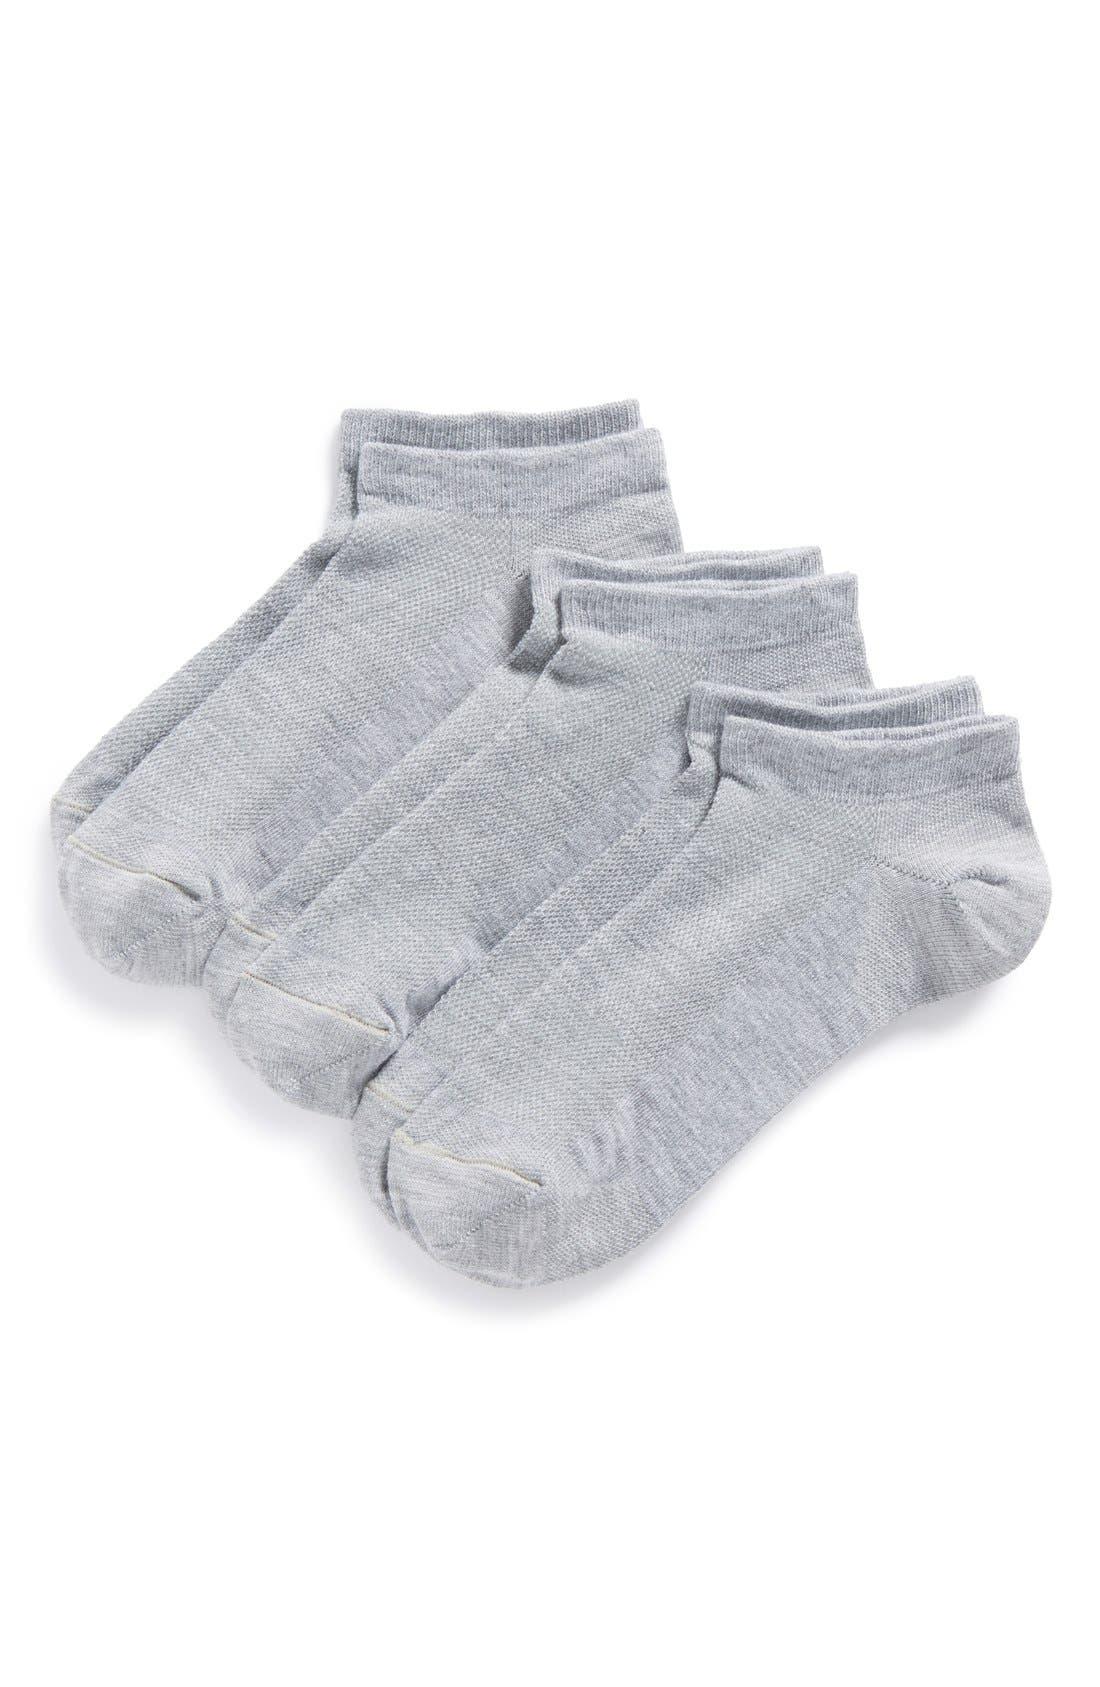 Alternate Image 1 Selected - Zella Fitness 3-Pack Liner Socks